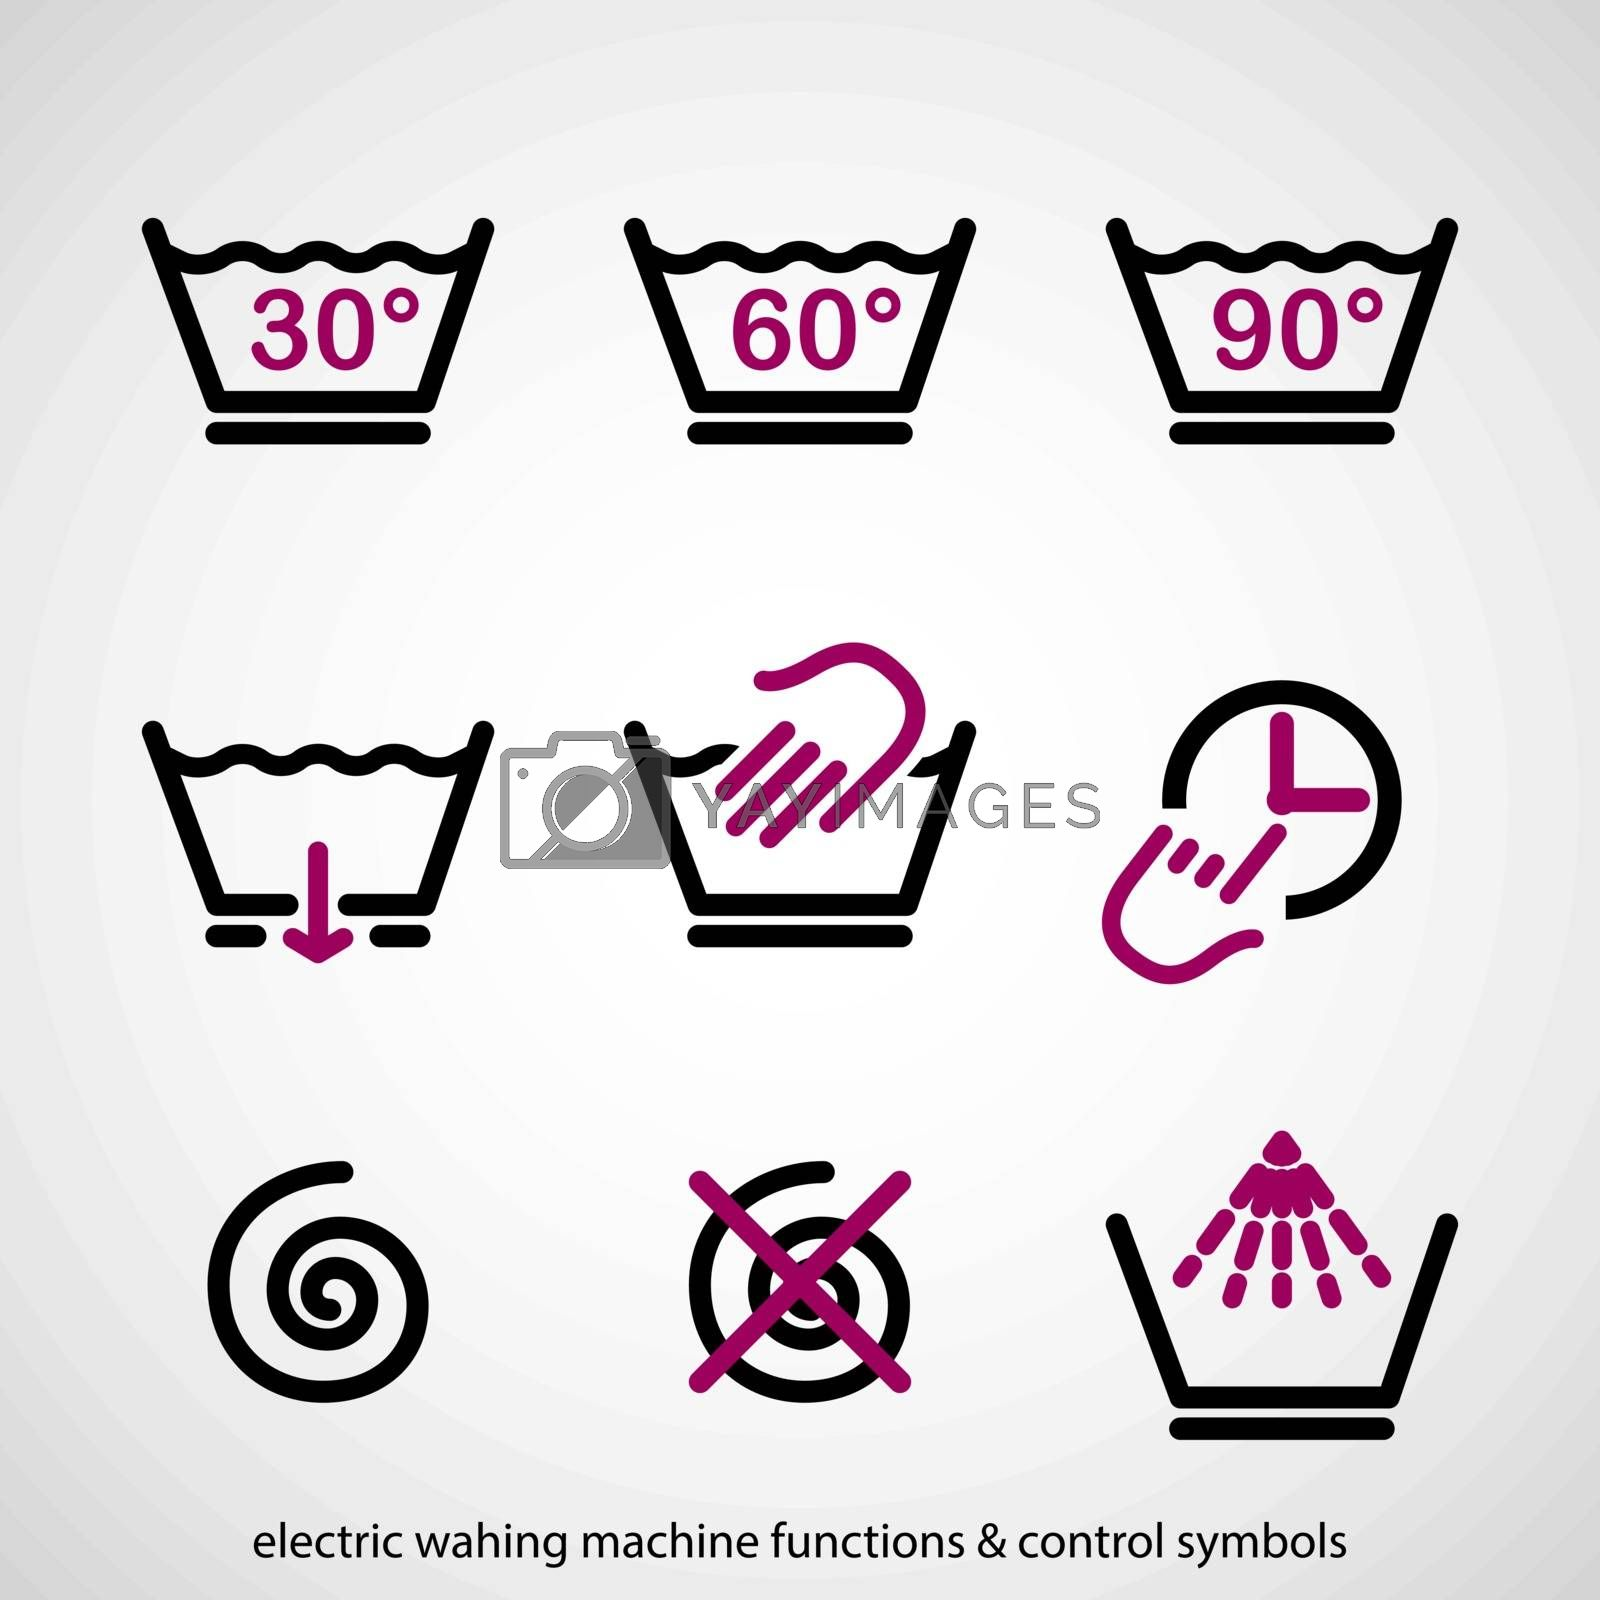 Electric washing machine functions & control symbols